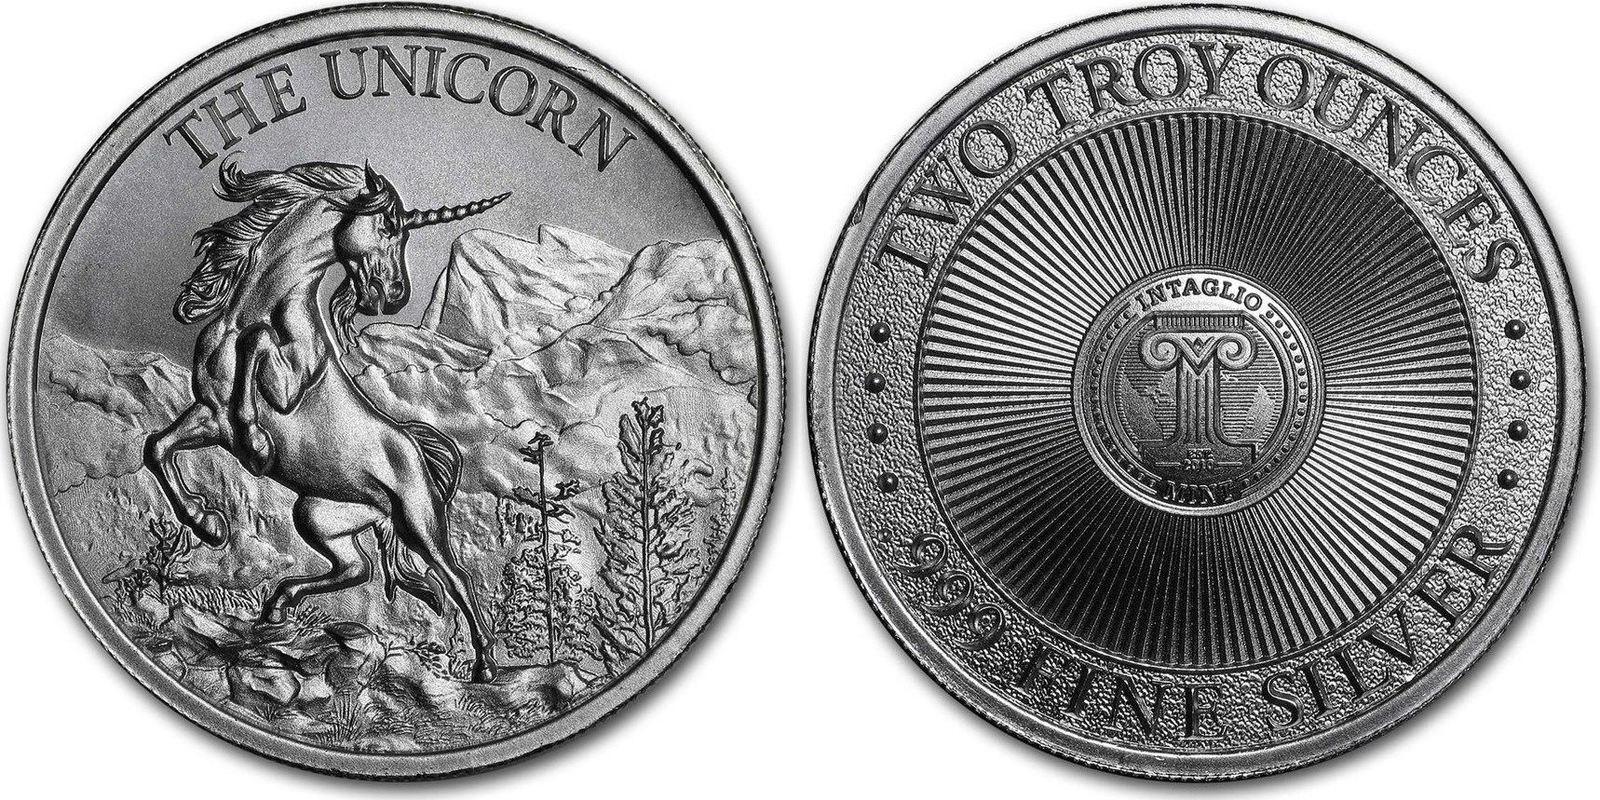 2020 THE UNICORN Cryptozoology silver BU rounds .999 fine silver 2 oz